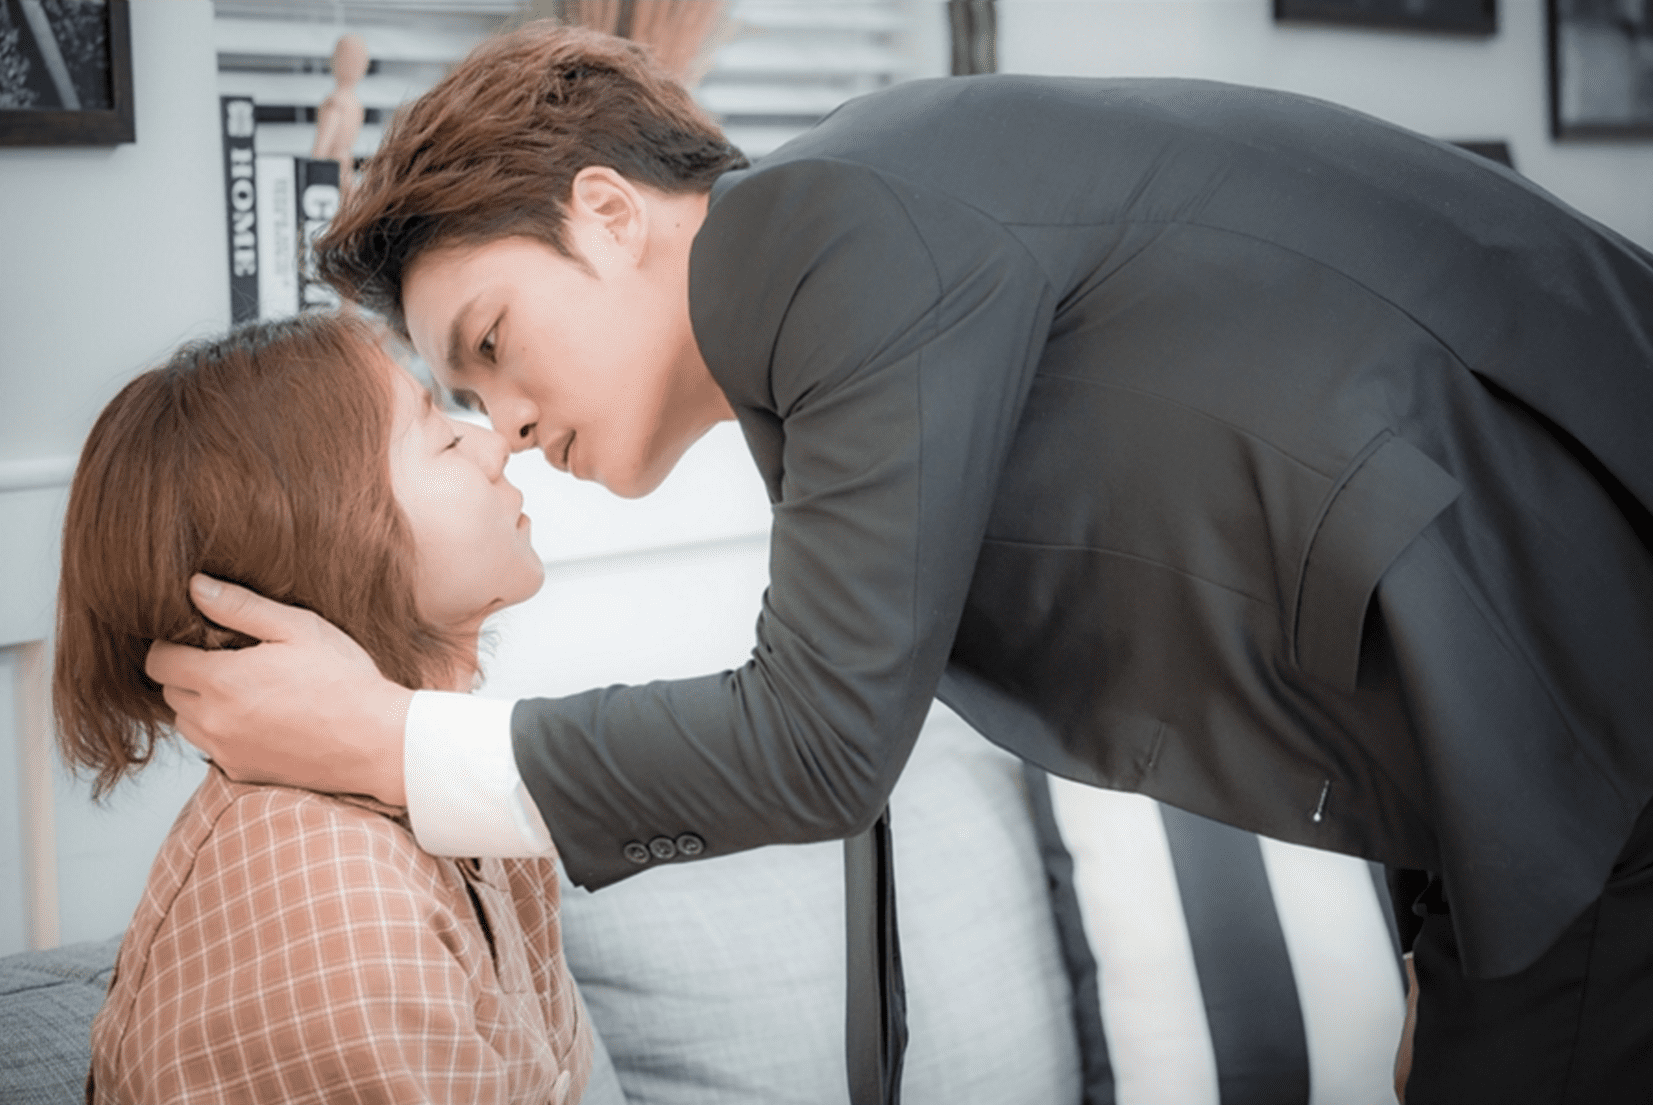 """Manhole"" Teases An Awkward Situation Between UEE, Kim Jaejoong, And Jang Mi Kwan In Stills"